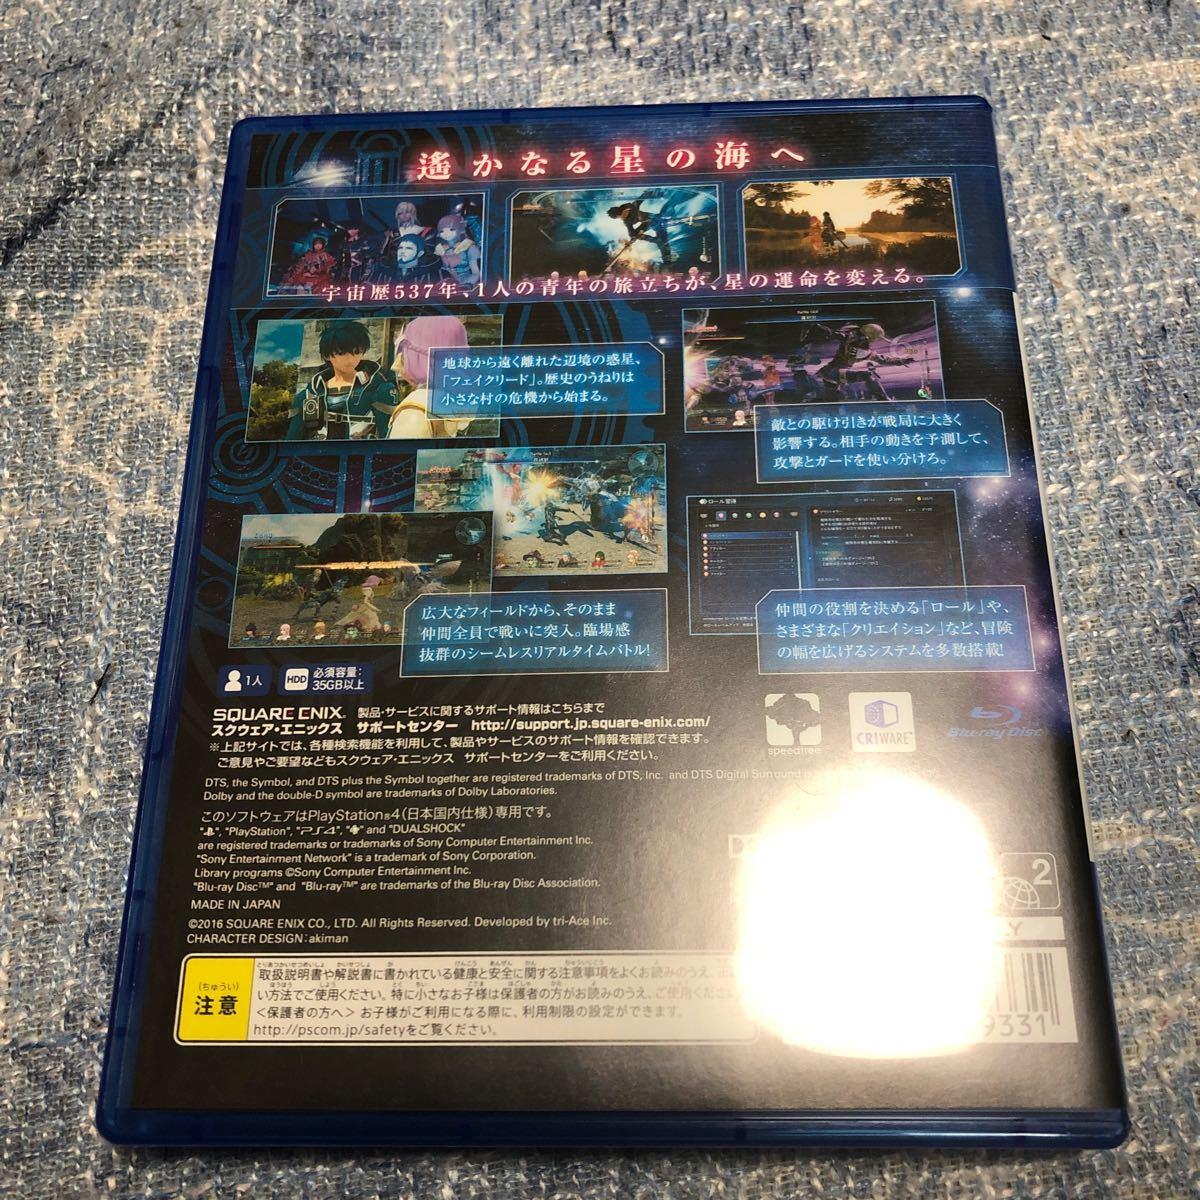 PS4 スターオーシャン5 -IntegrityandFaithlessness